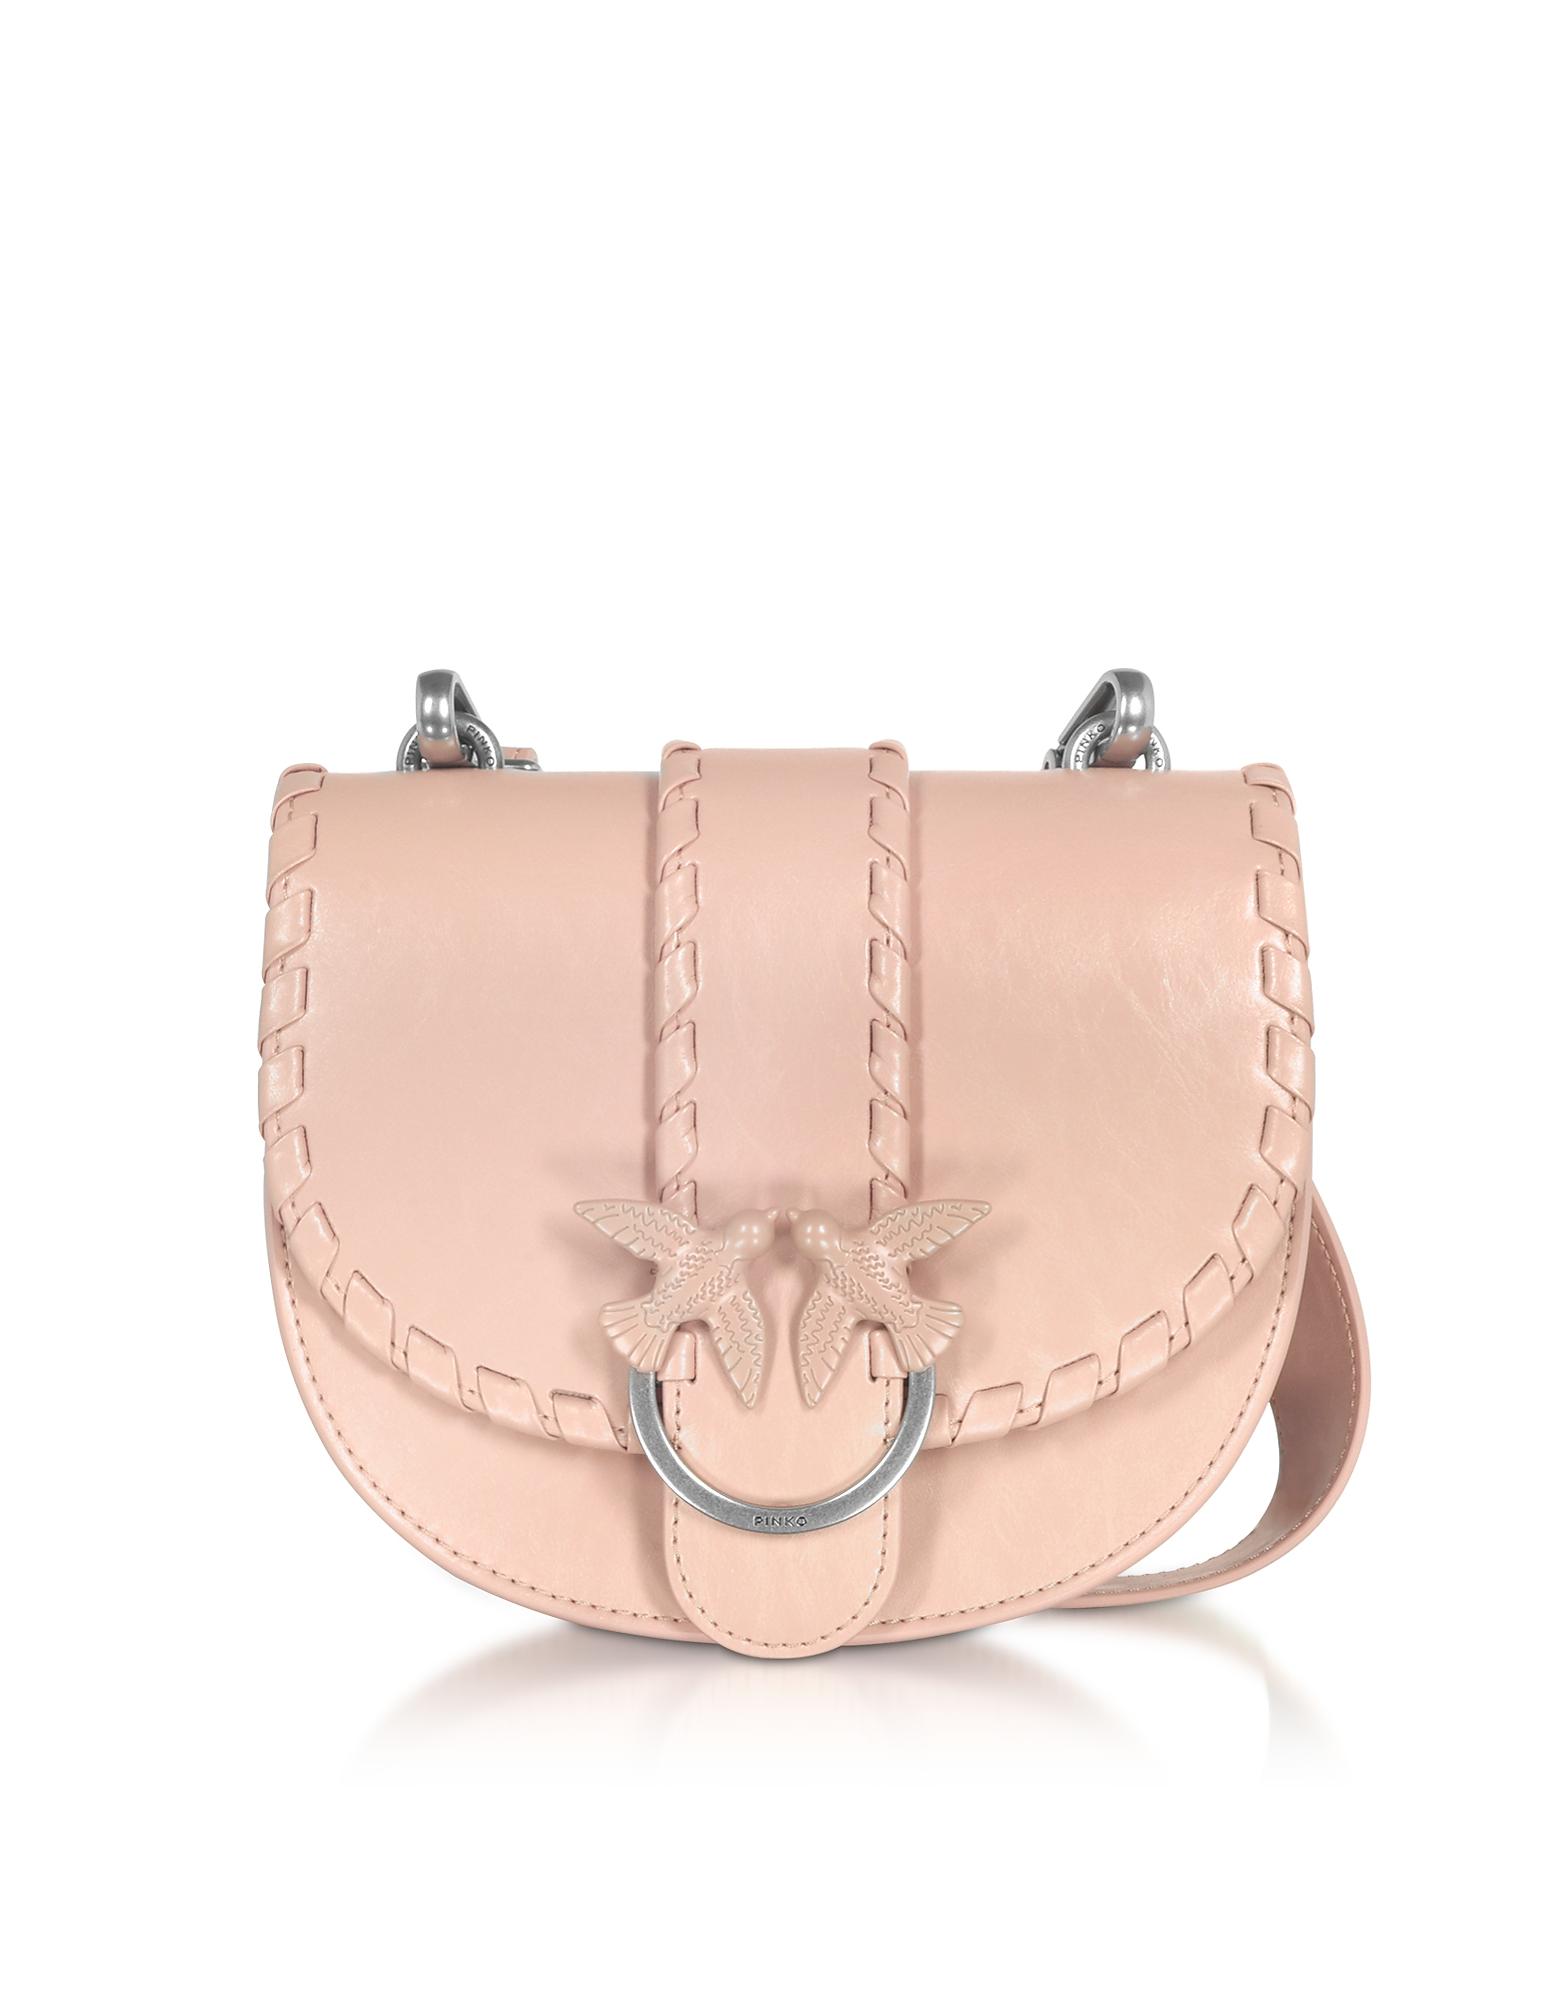 Pinko Designer Handbags, Light Pink Round Love Twist Crossbody Bag